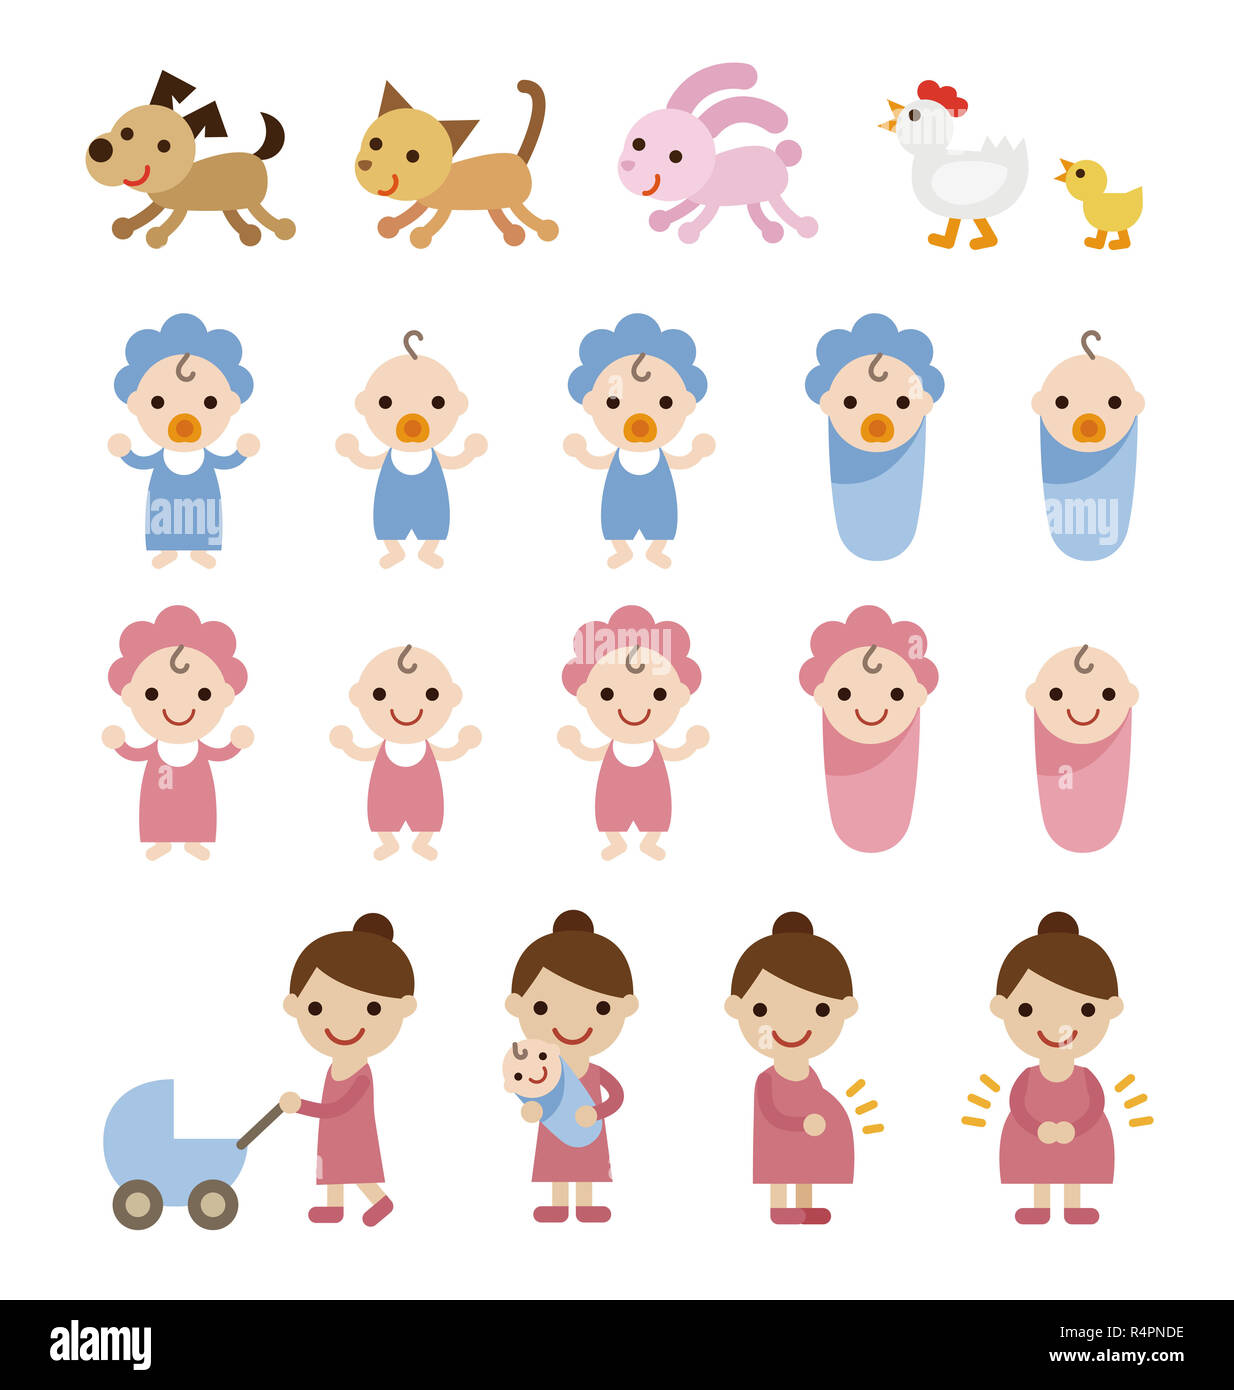 Mom, babies and pets illustration set - Stock Image